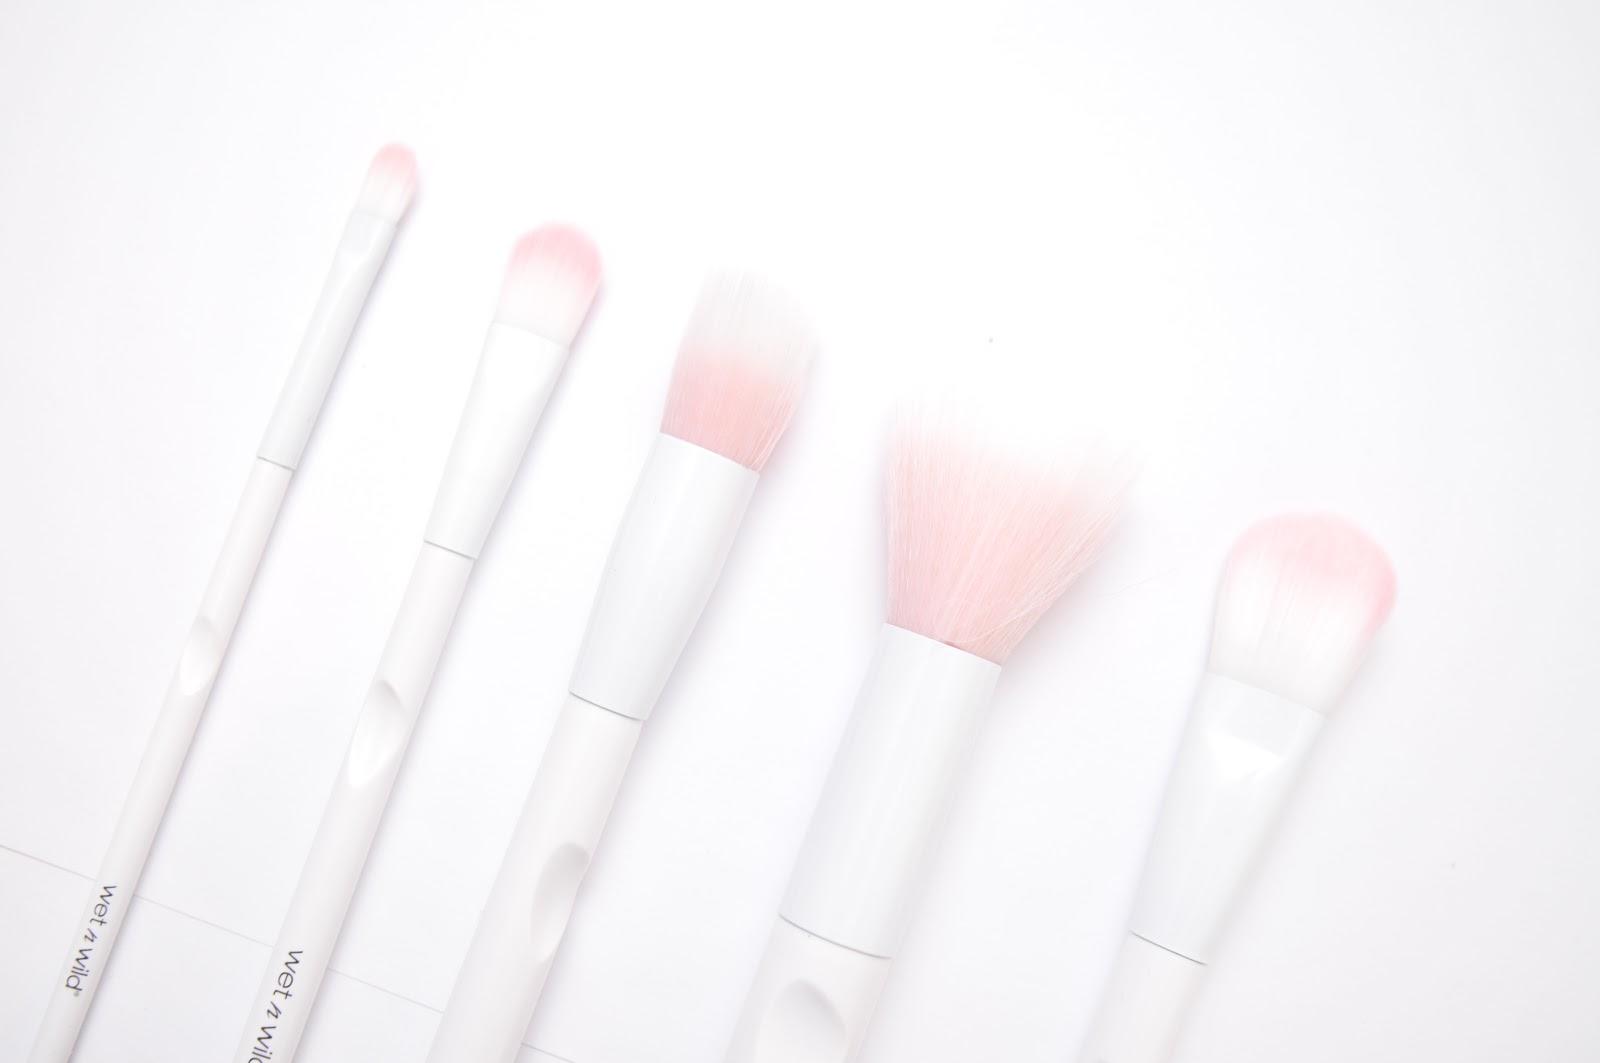 Wild N Wet Brushes